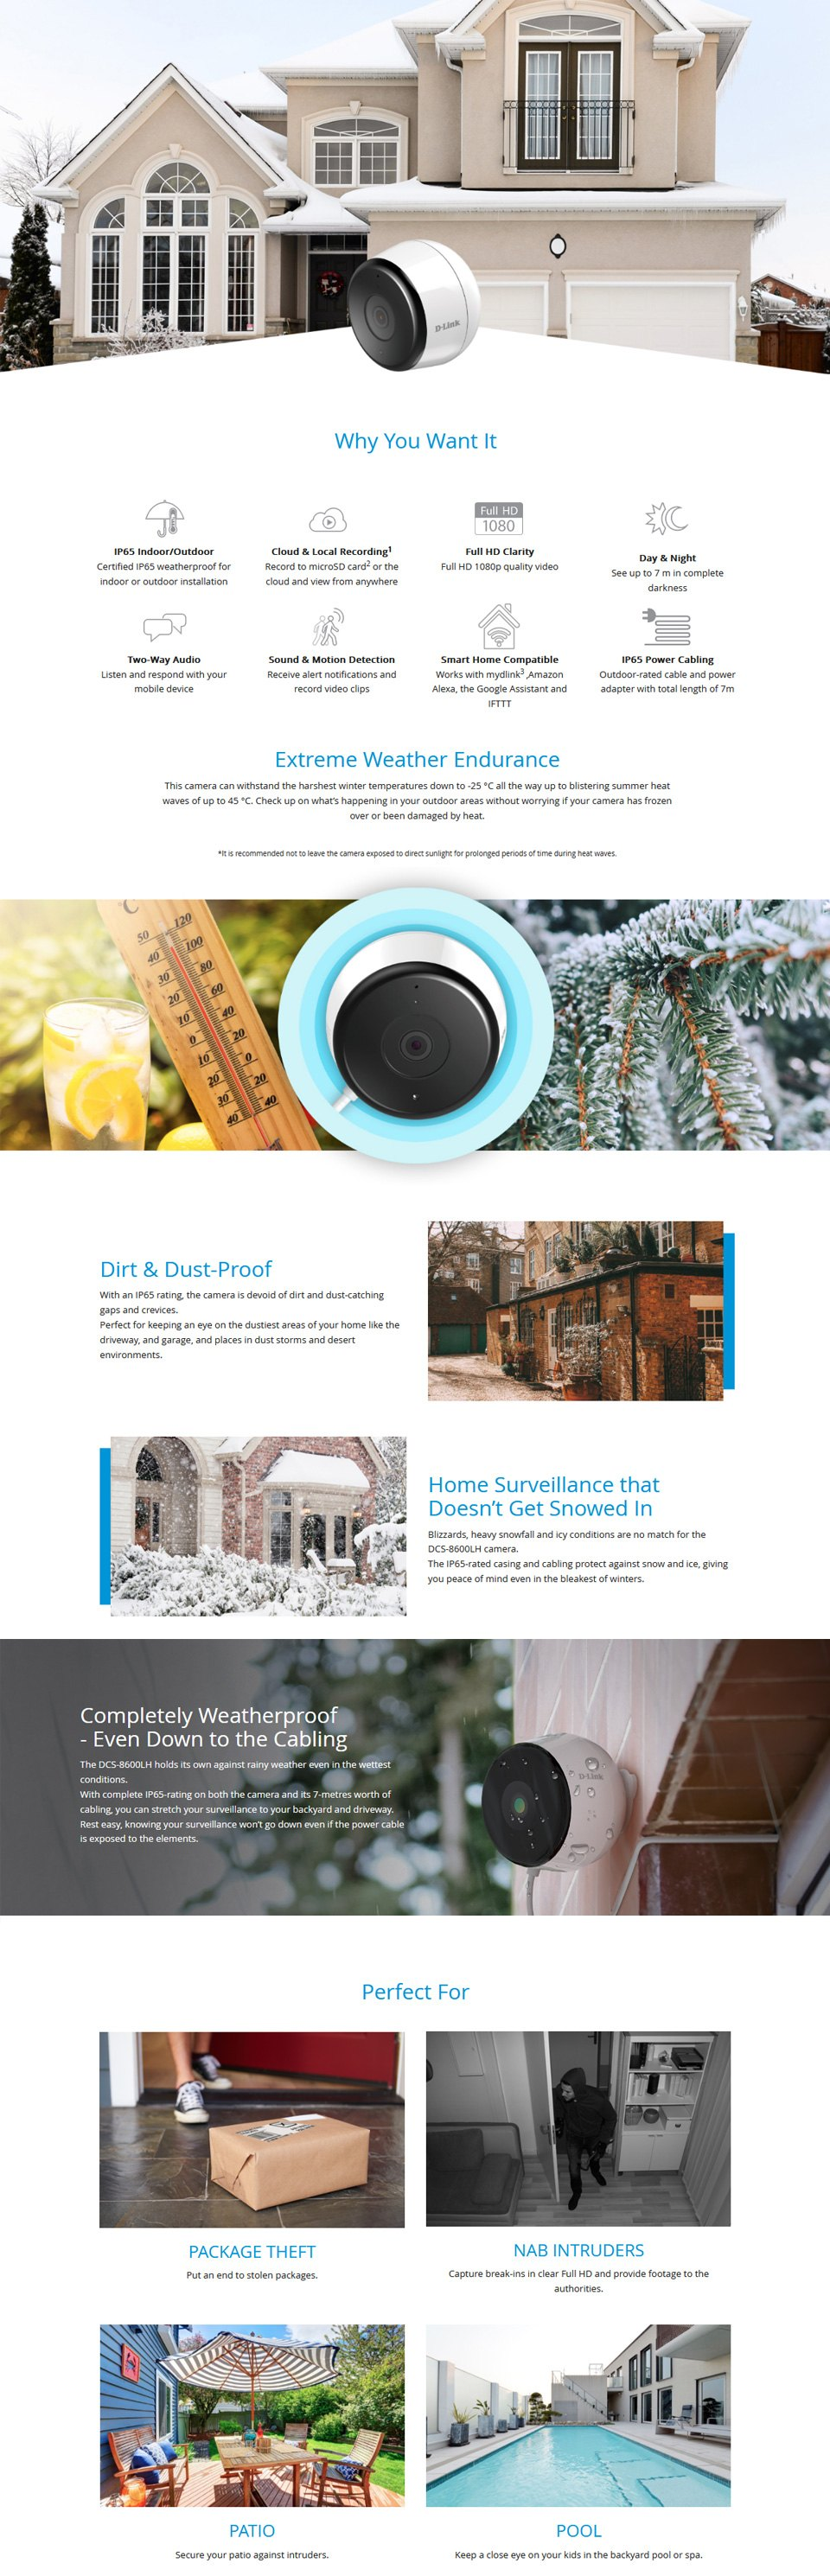 D-Link DCS-8600LH 1080P Outdoor Wireless Camera features